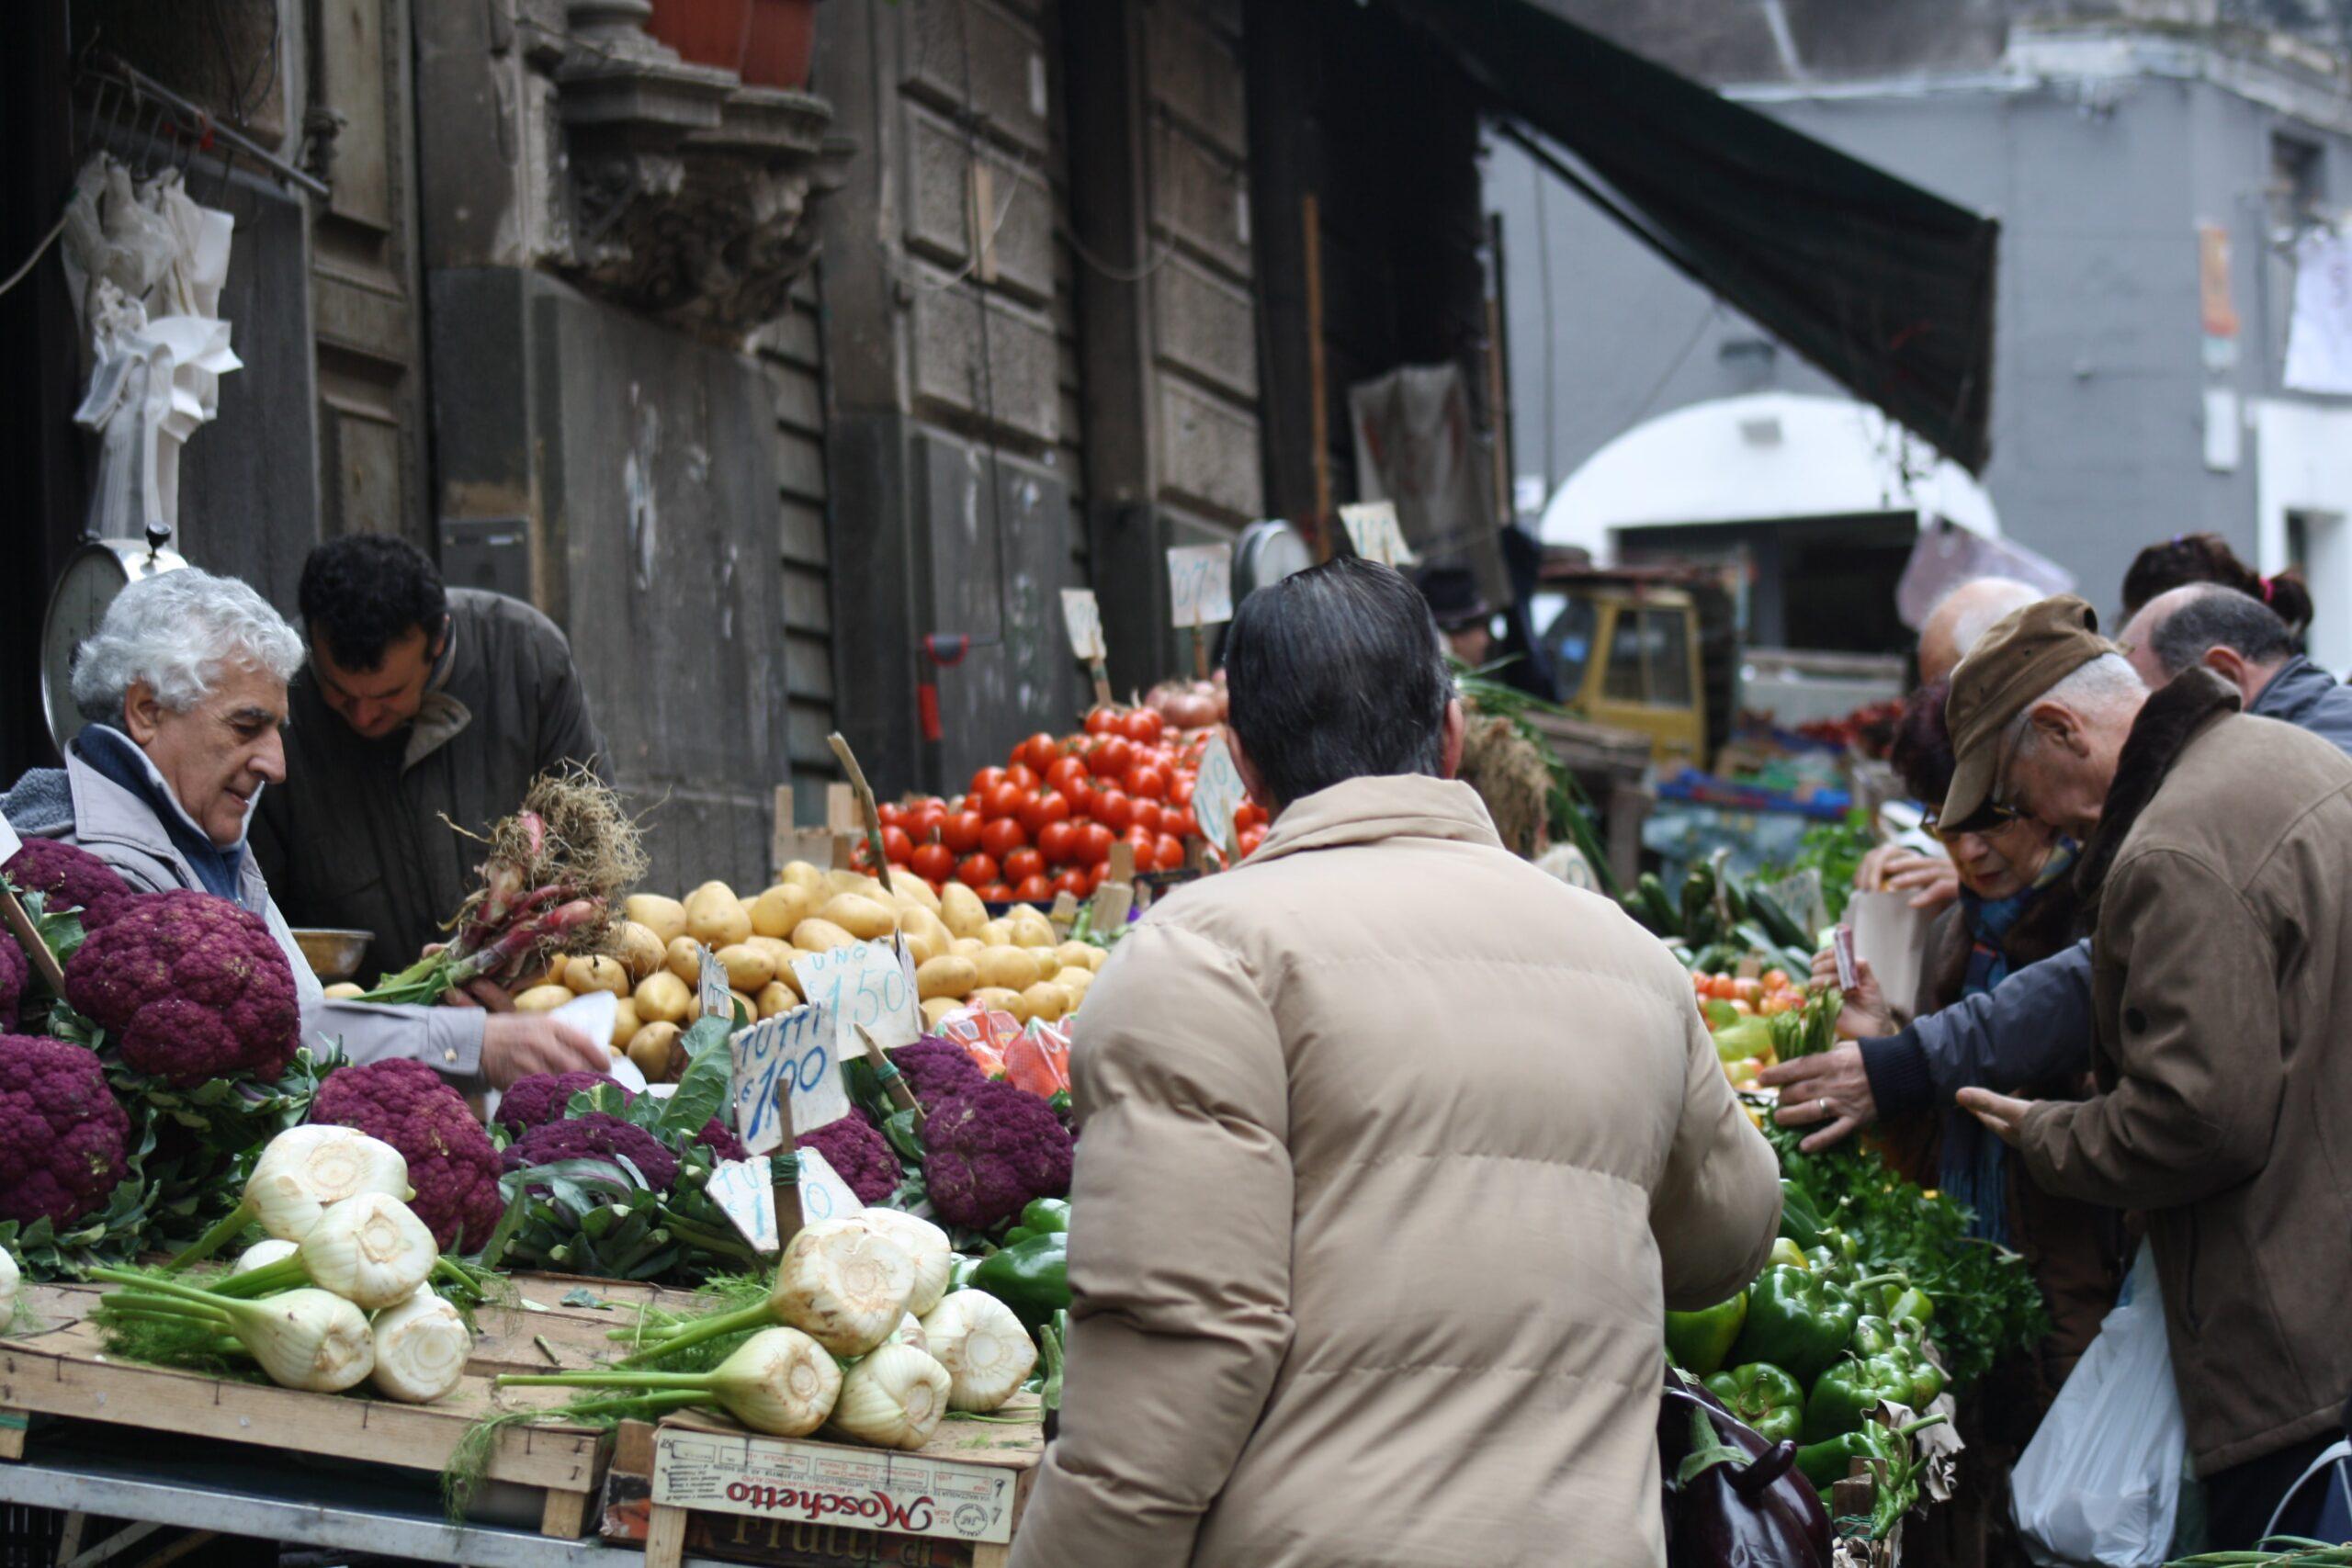 Discover Catania On Our Catania Street Food Evening Tour